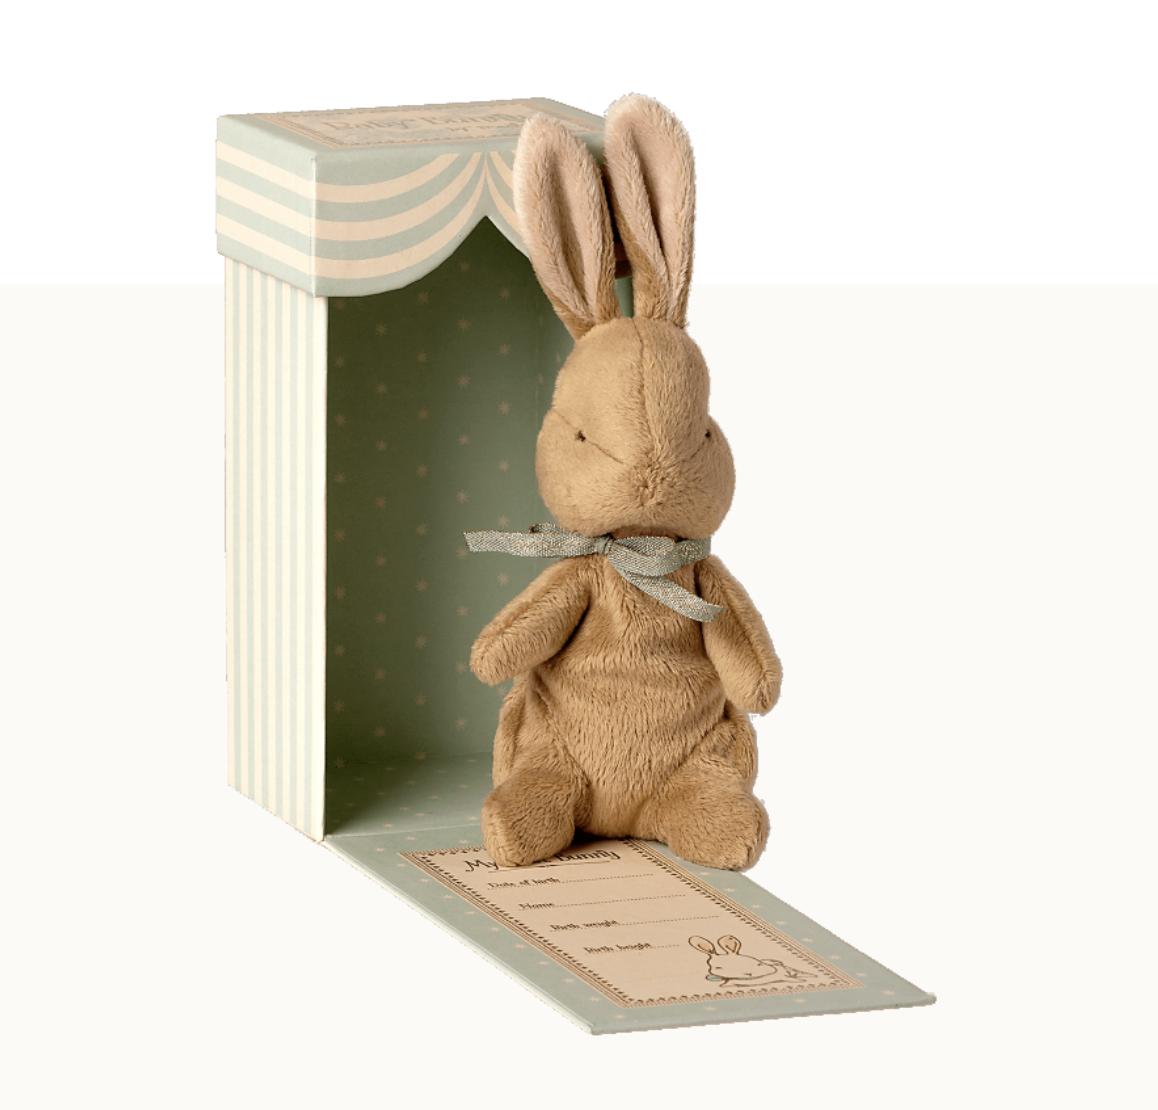 Maileg maileg my first bunny in box, light blue